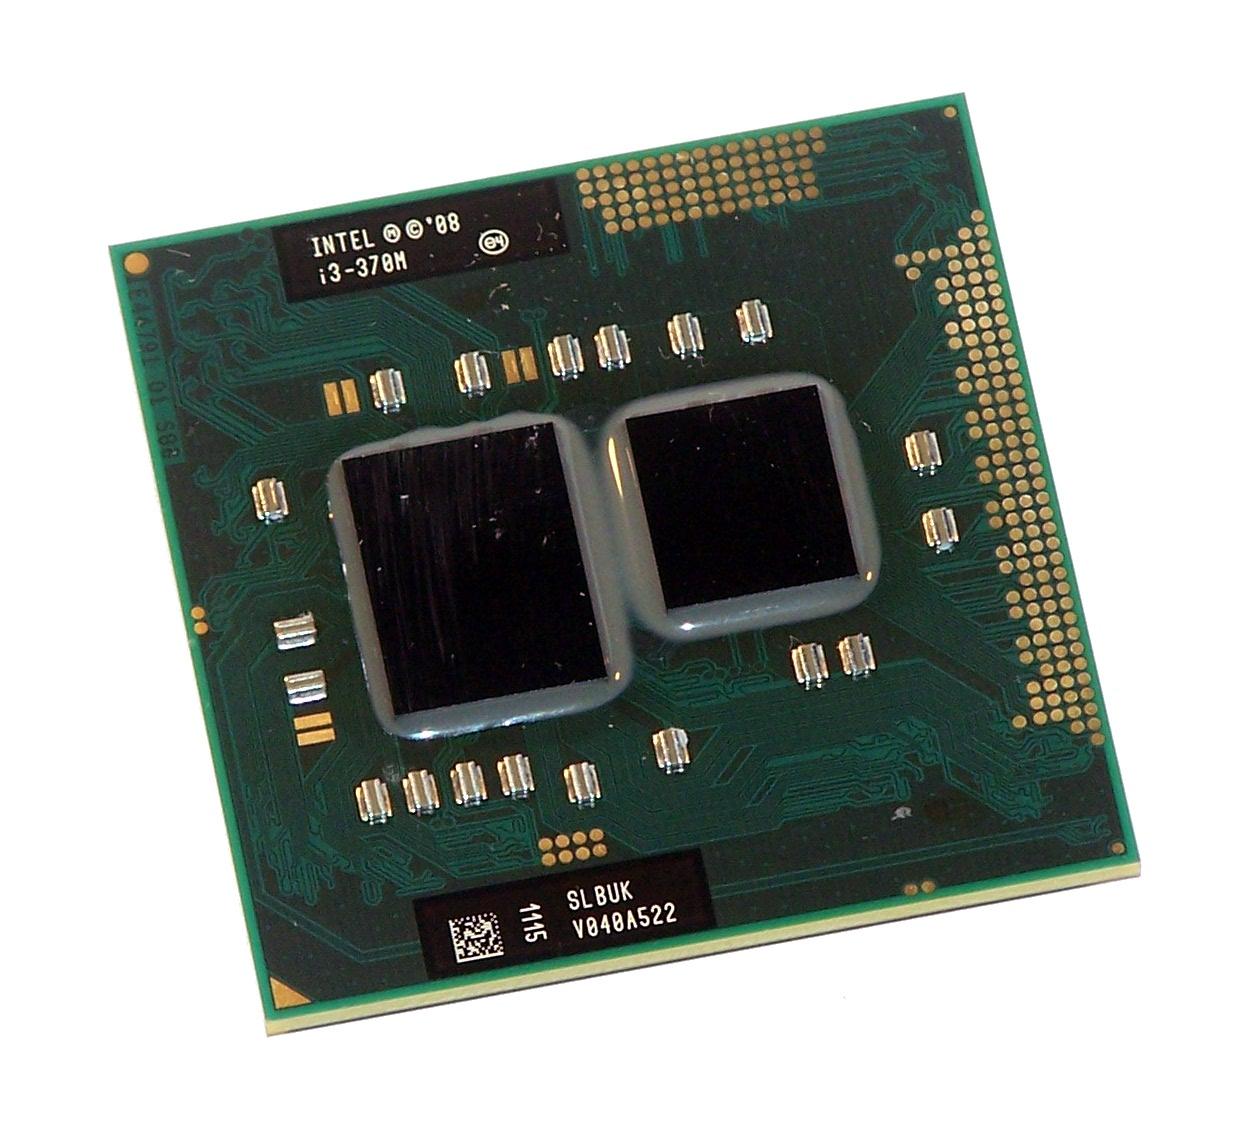 Intel SLBUK Core i3-370M M Laptop CPU Processor G1 2.4GHz 3MB